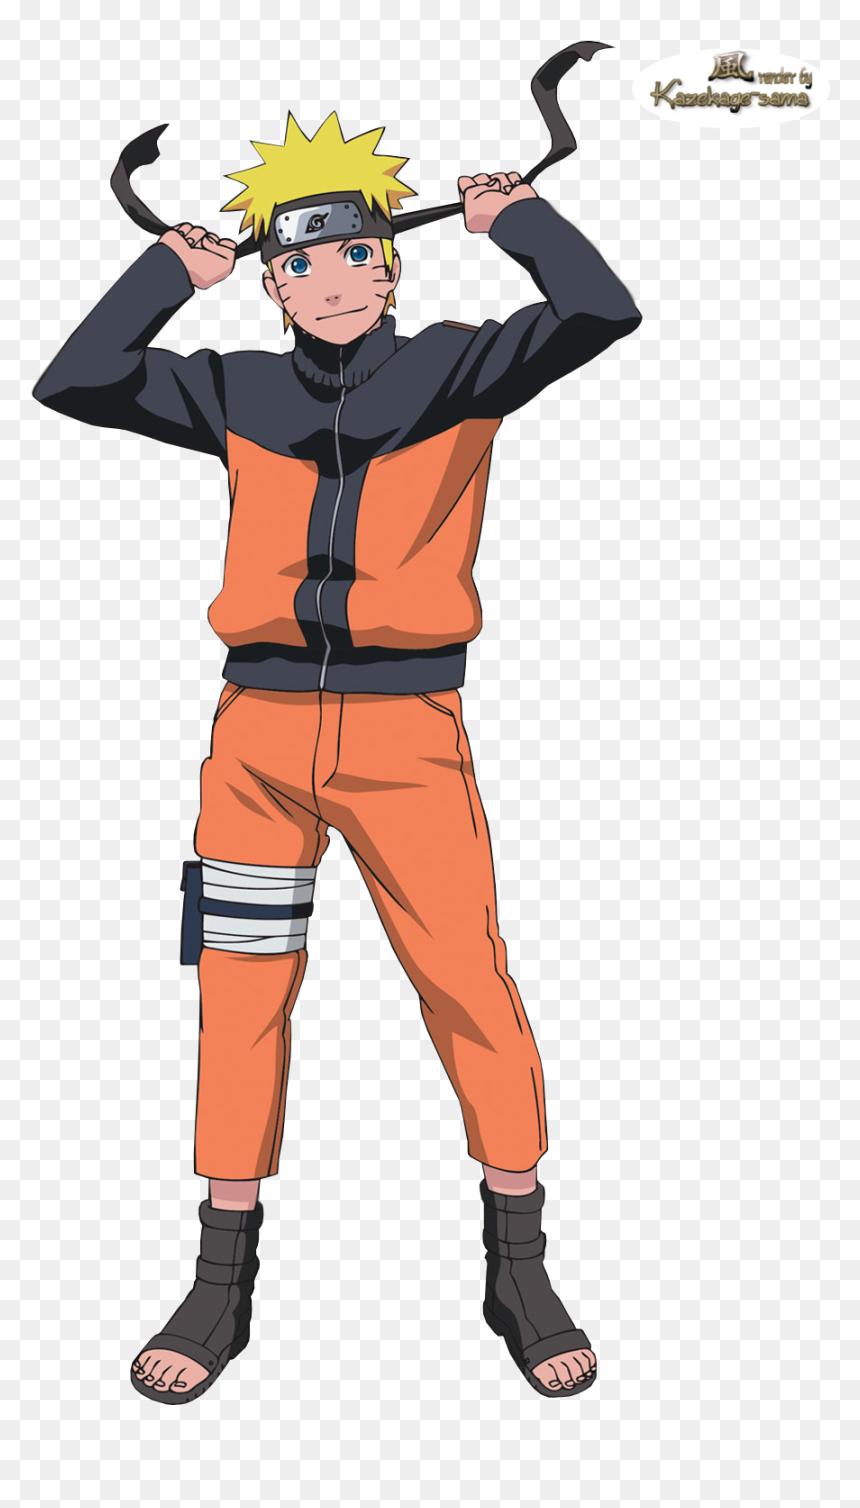 Naruto Shippuden Naruto Uzumaki Transparent Hd Png Download Is Pure And Creative Png Image Uploaded By Designer To Sea In 2021 Naruto Naruto Uzumaki Naruto Shippuden